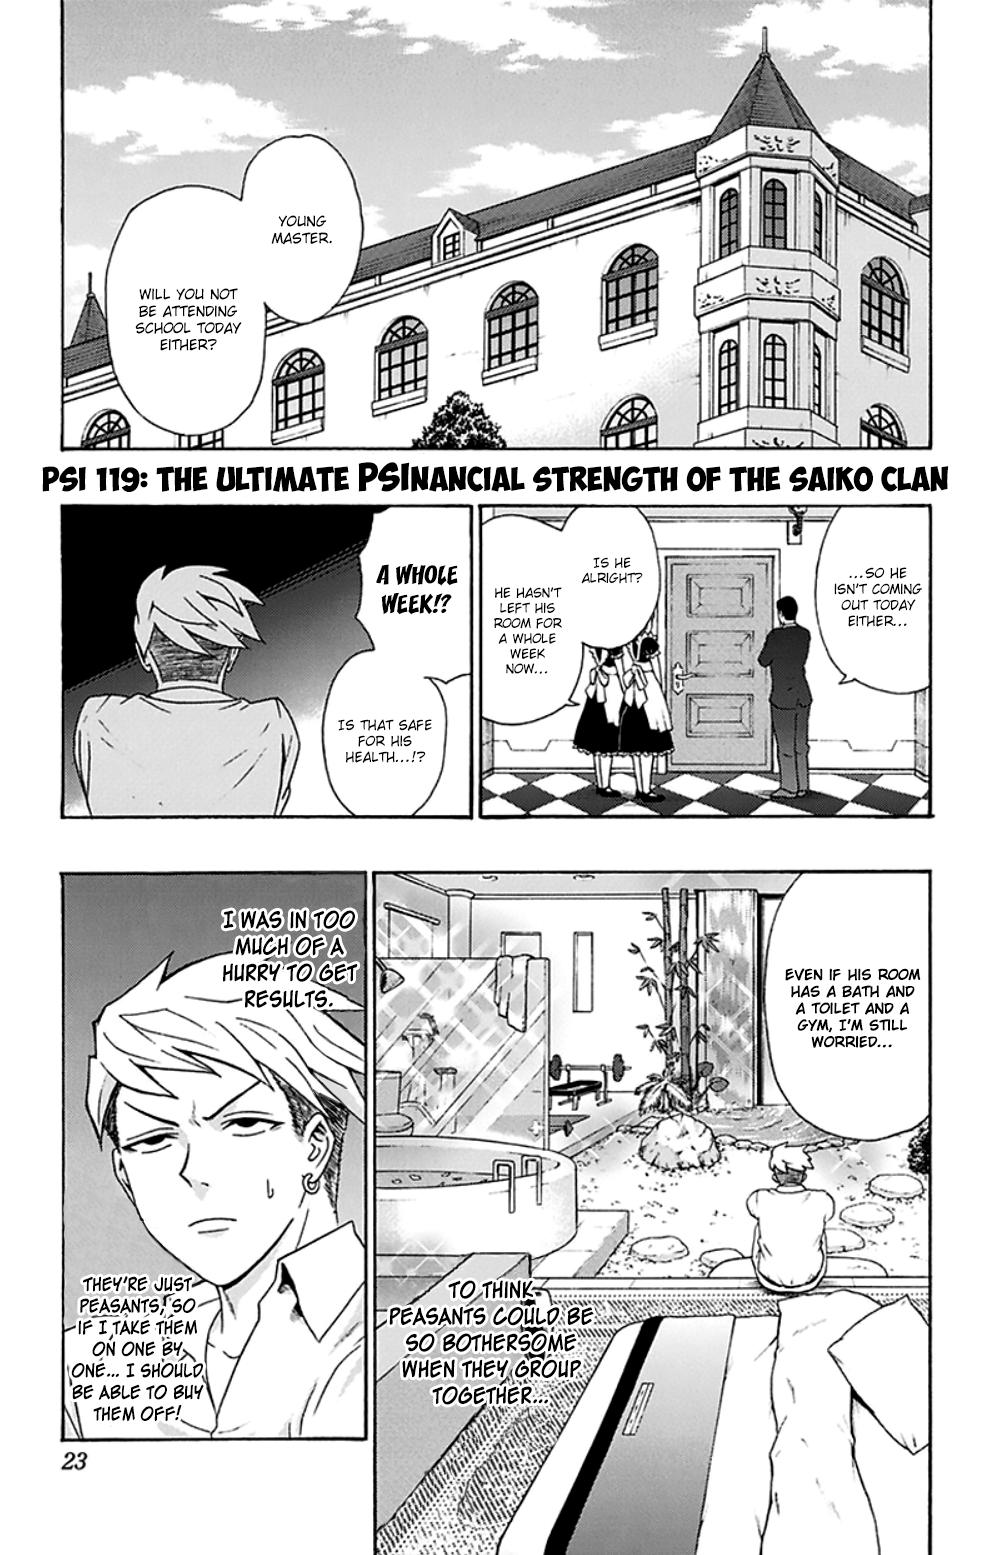 Saiki Kusuo no Psi Nan - The Ultimate PSInancial Strength of the Saiko Clan - 2